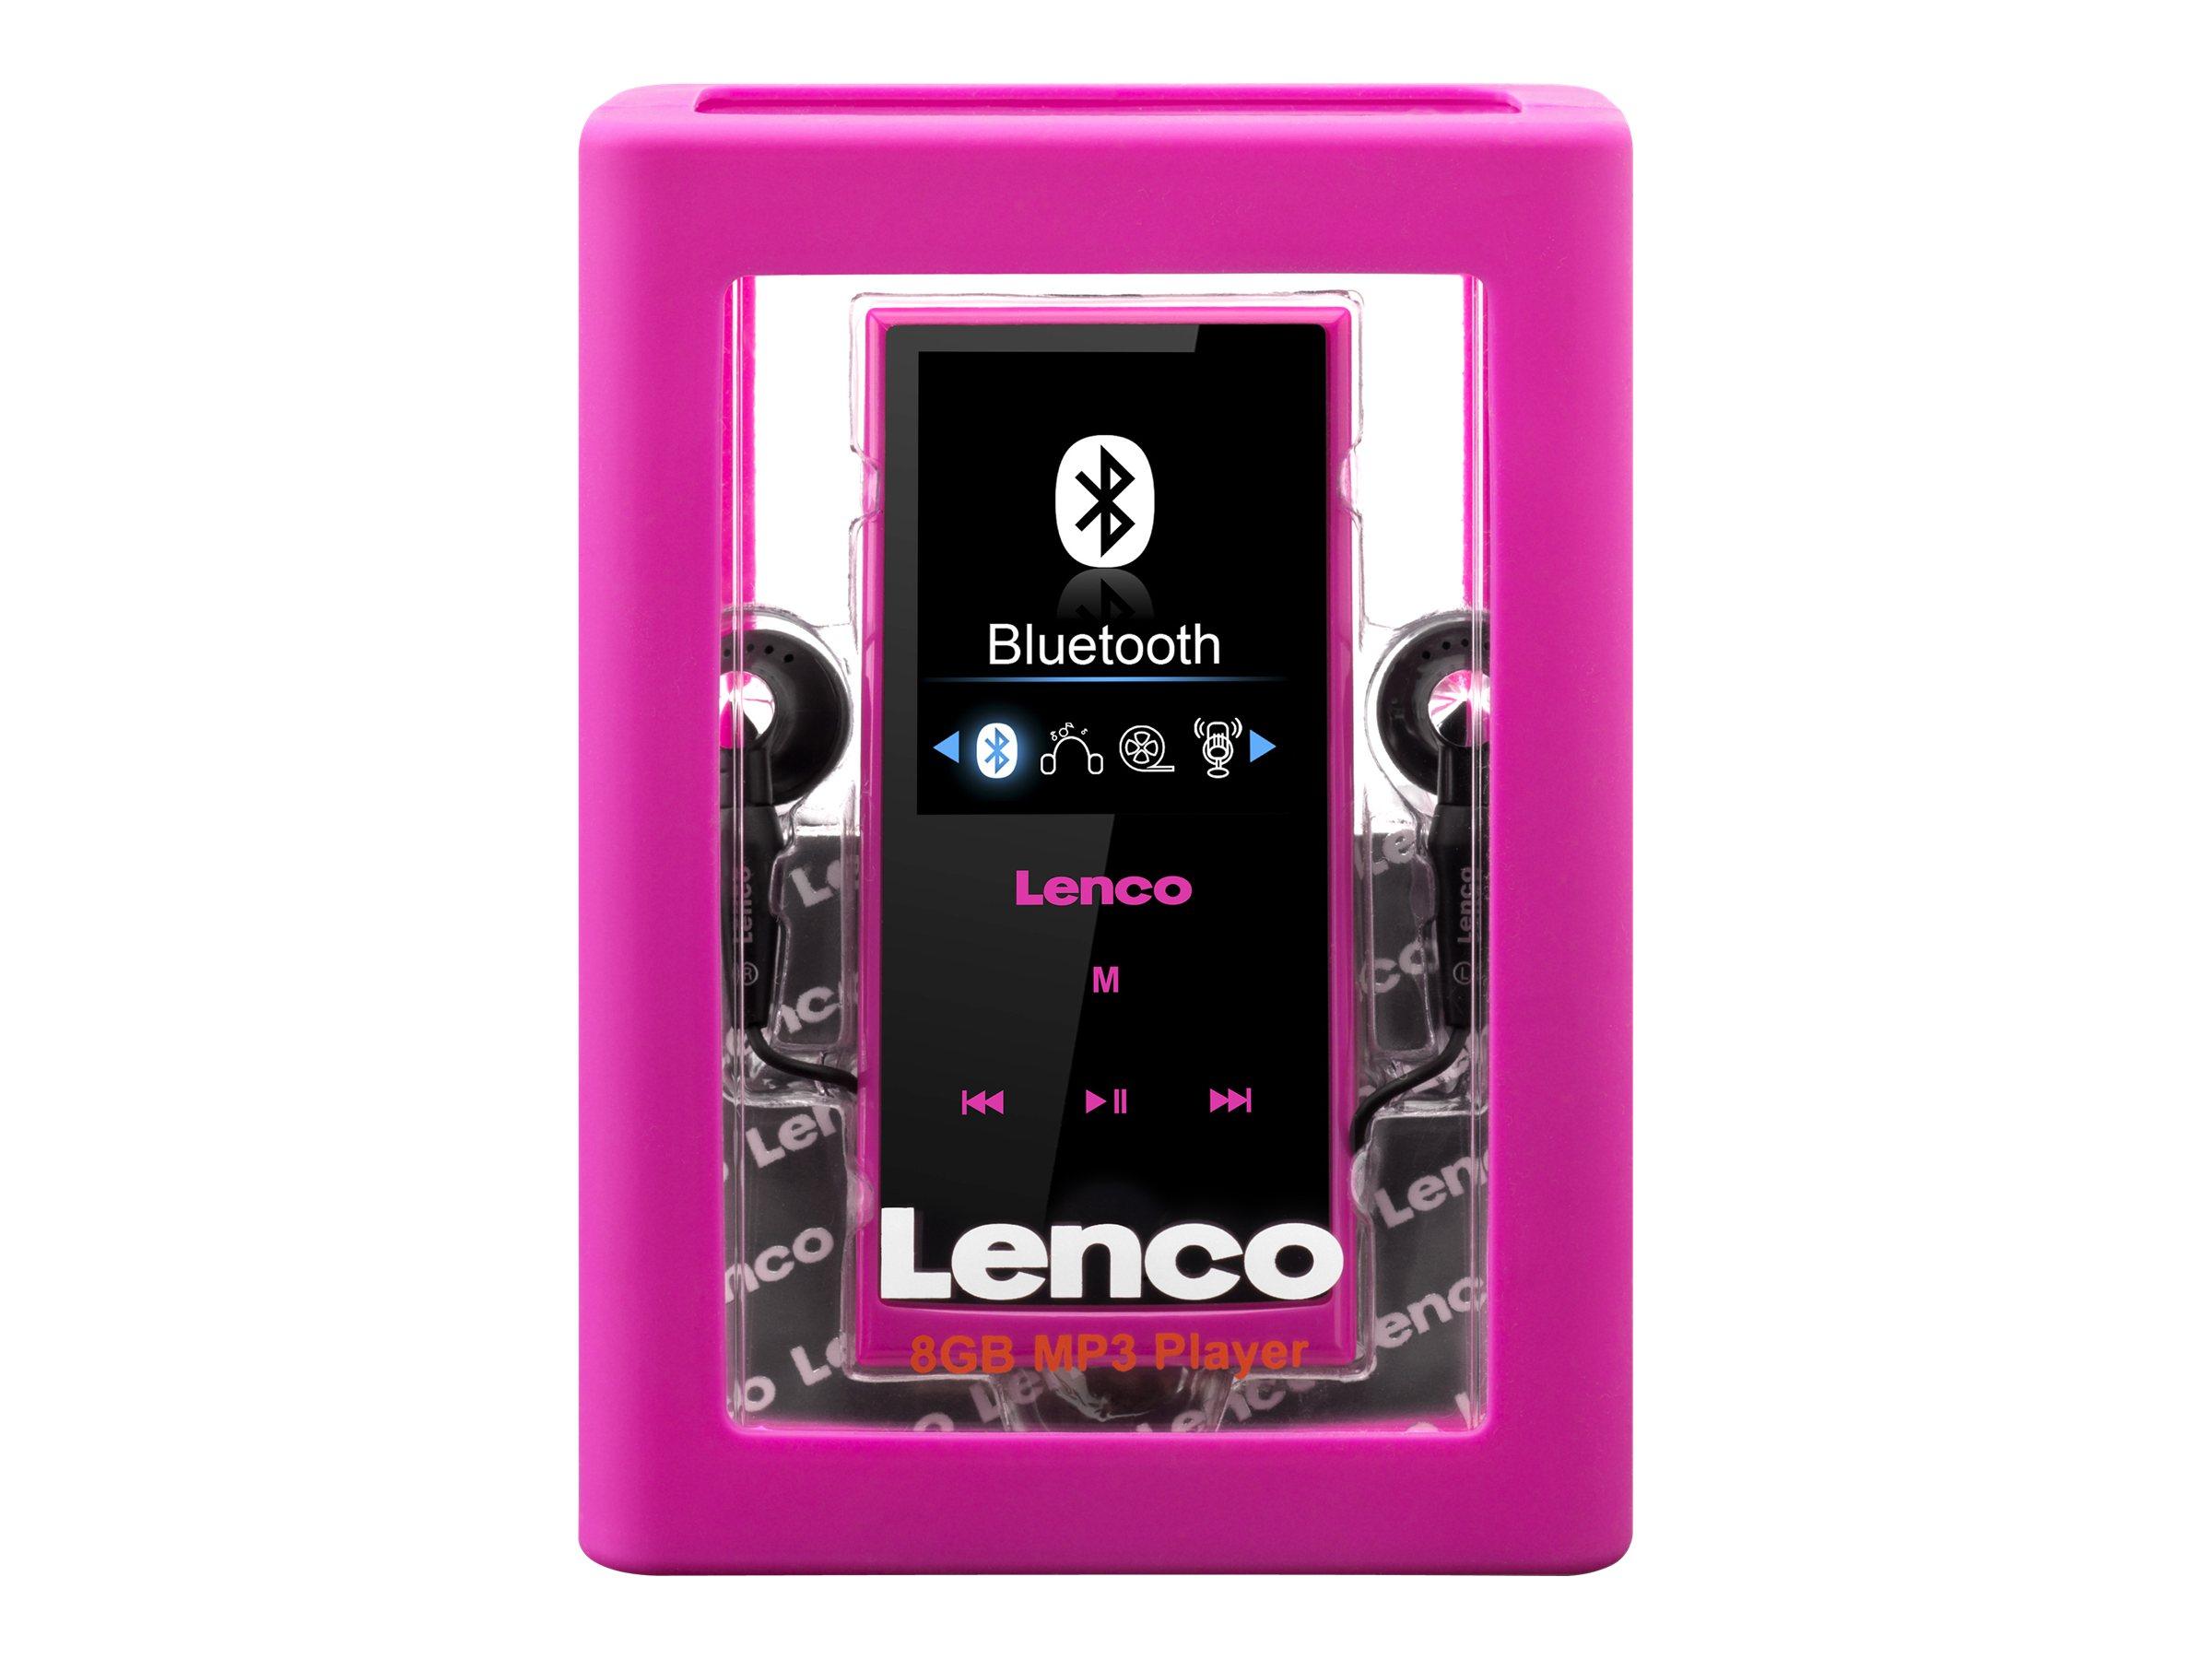 Lenco XEMIO-760 BT - Digital Player - 8 GB - pink